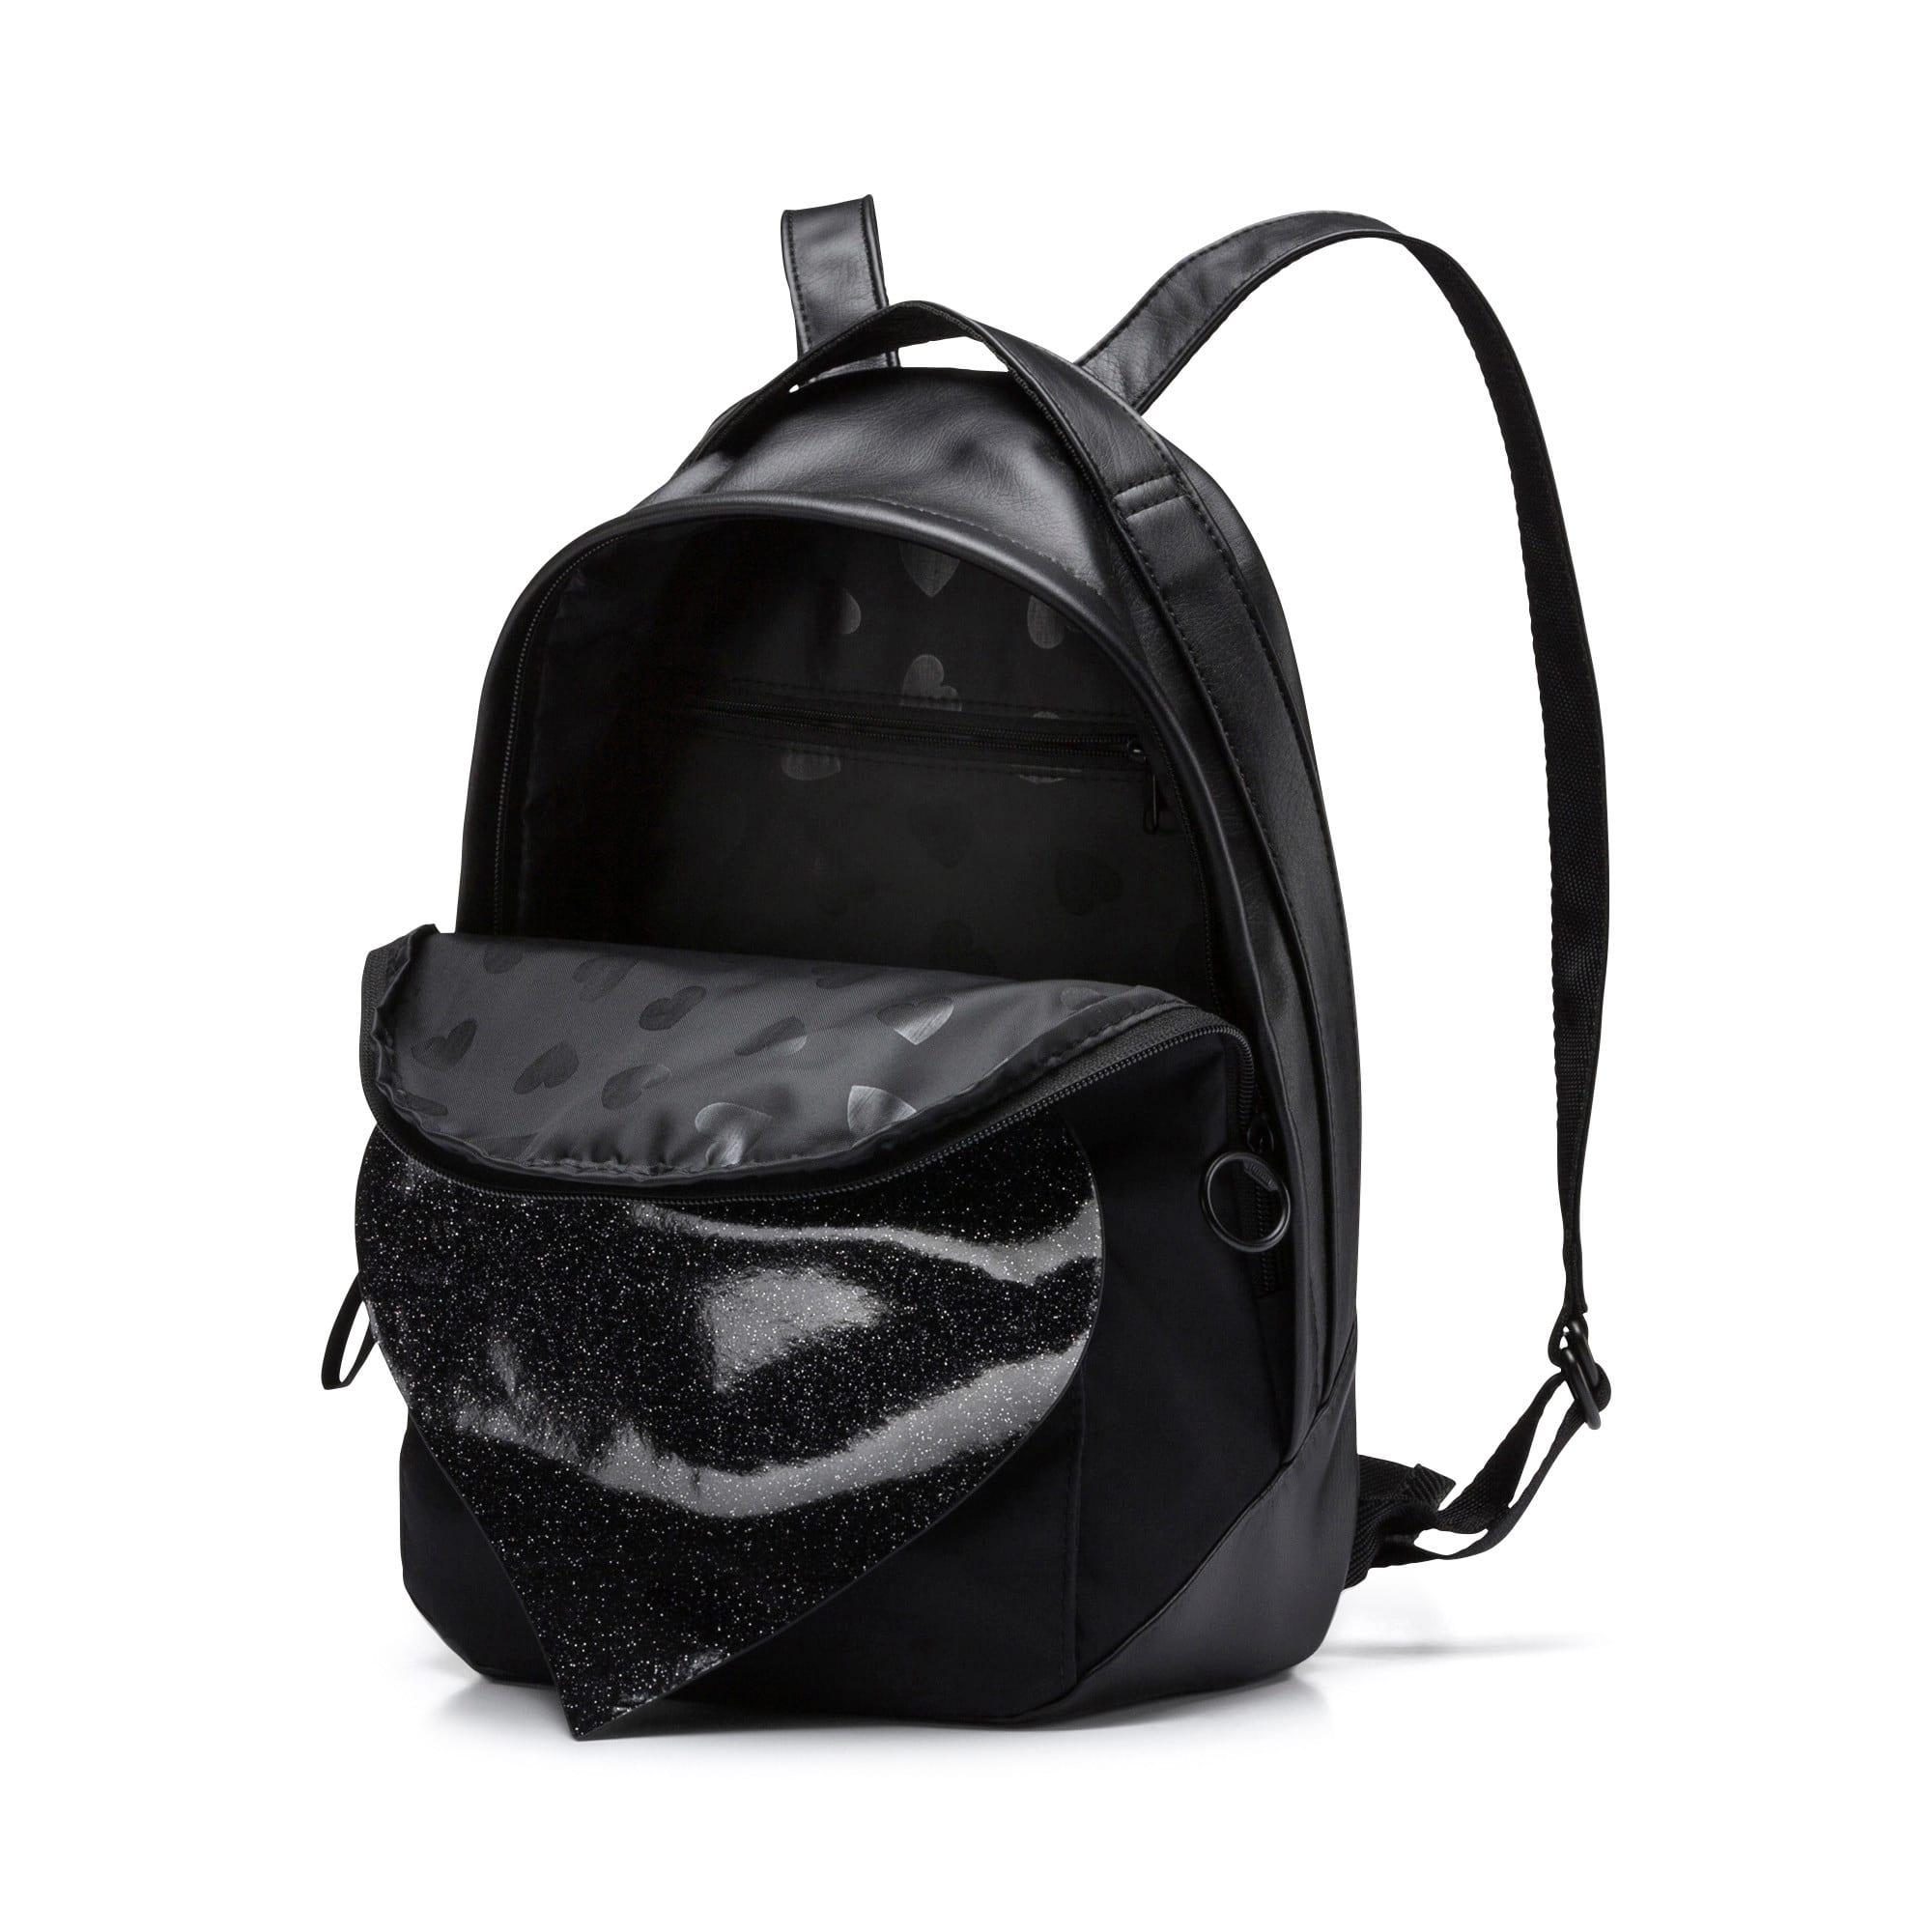 Thumbnail 4 of Prime Archive Valentine Backpack, Puma Black, medium